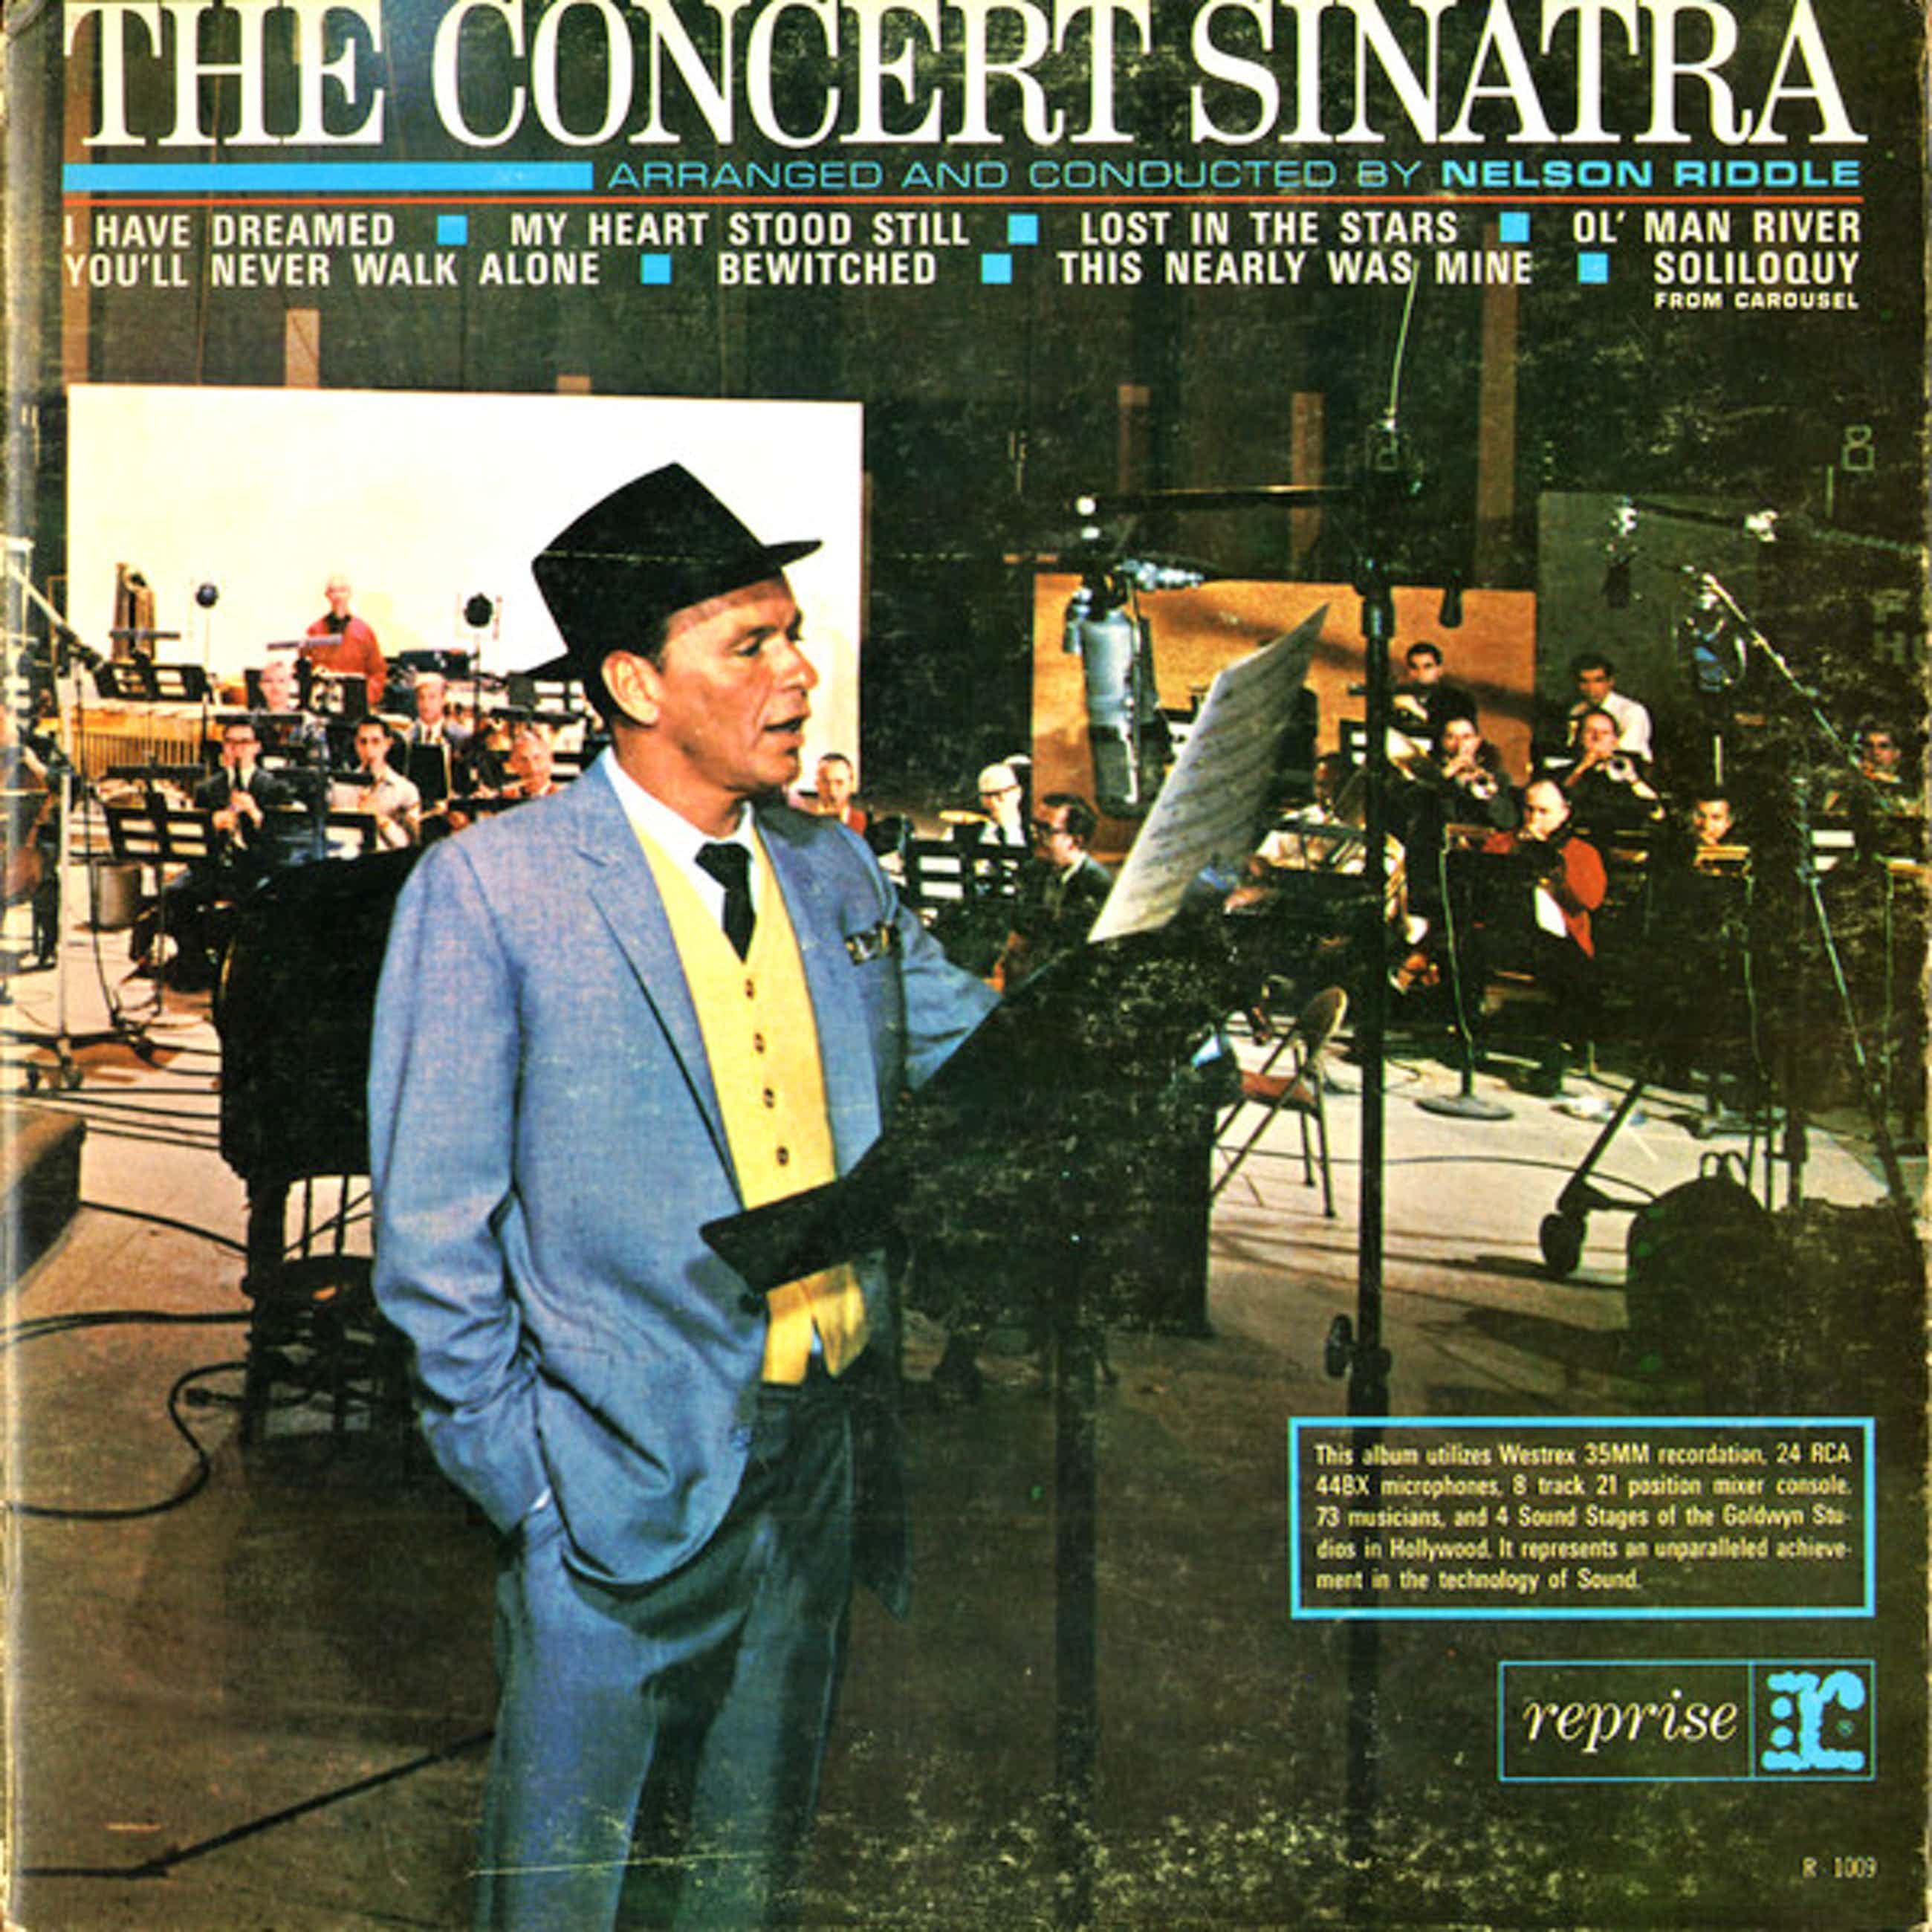 Frank Sinatra - The Concert Sinatra kopen? Bied vanaf 10!